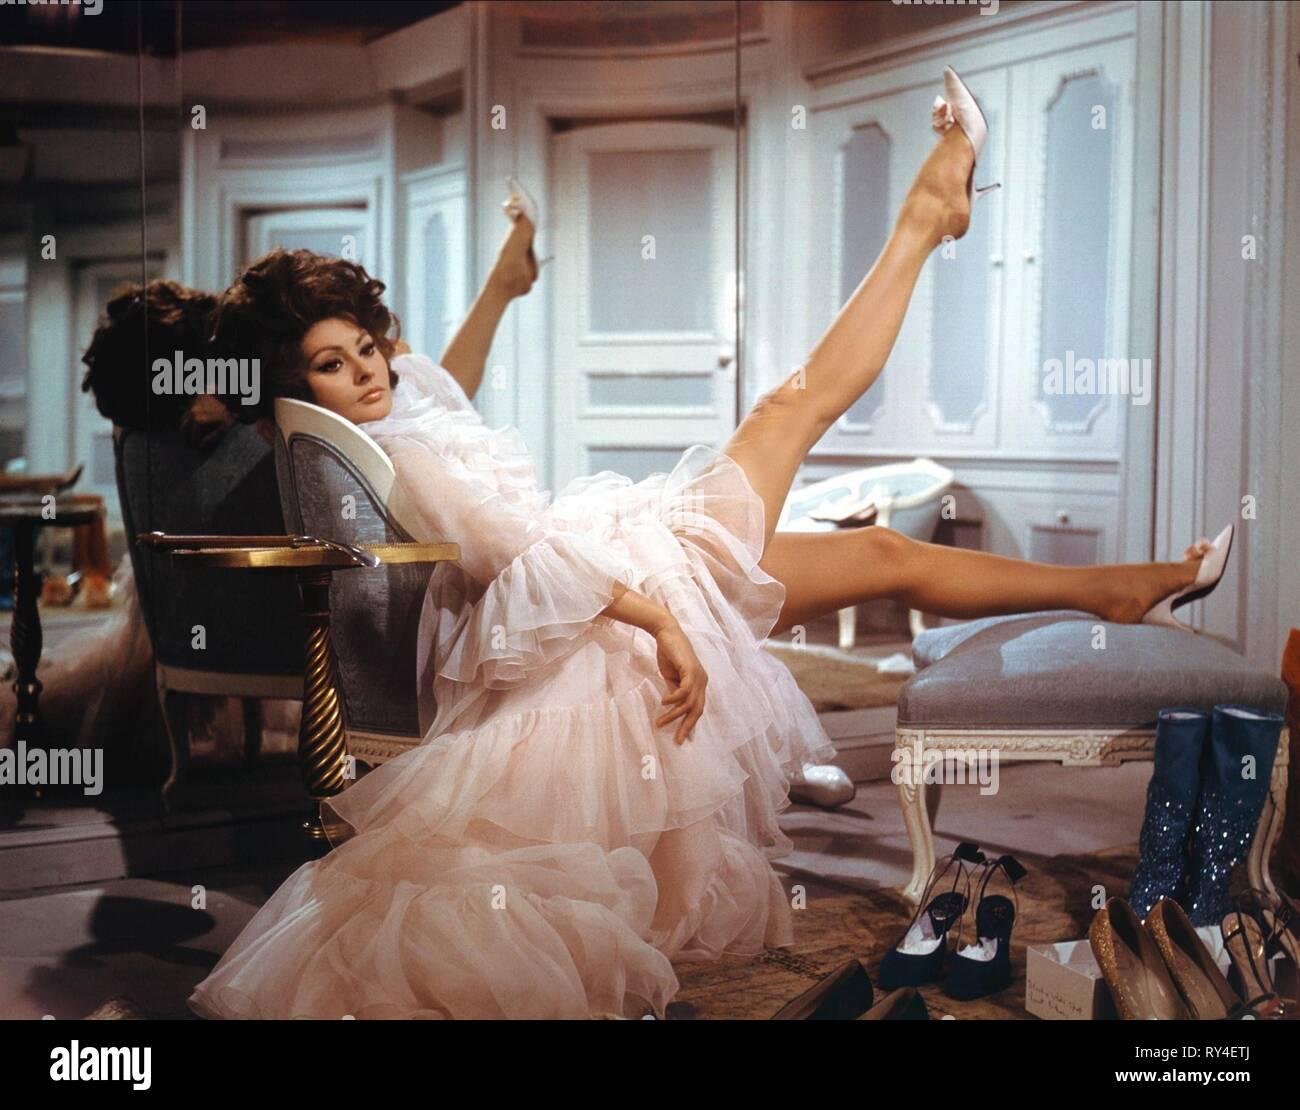 SOPHIA LOREN, ARABESQUE, 1966 - Stock Image